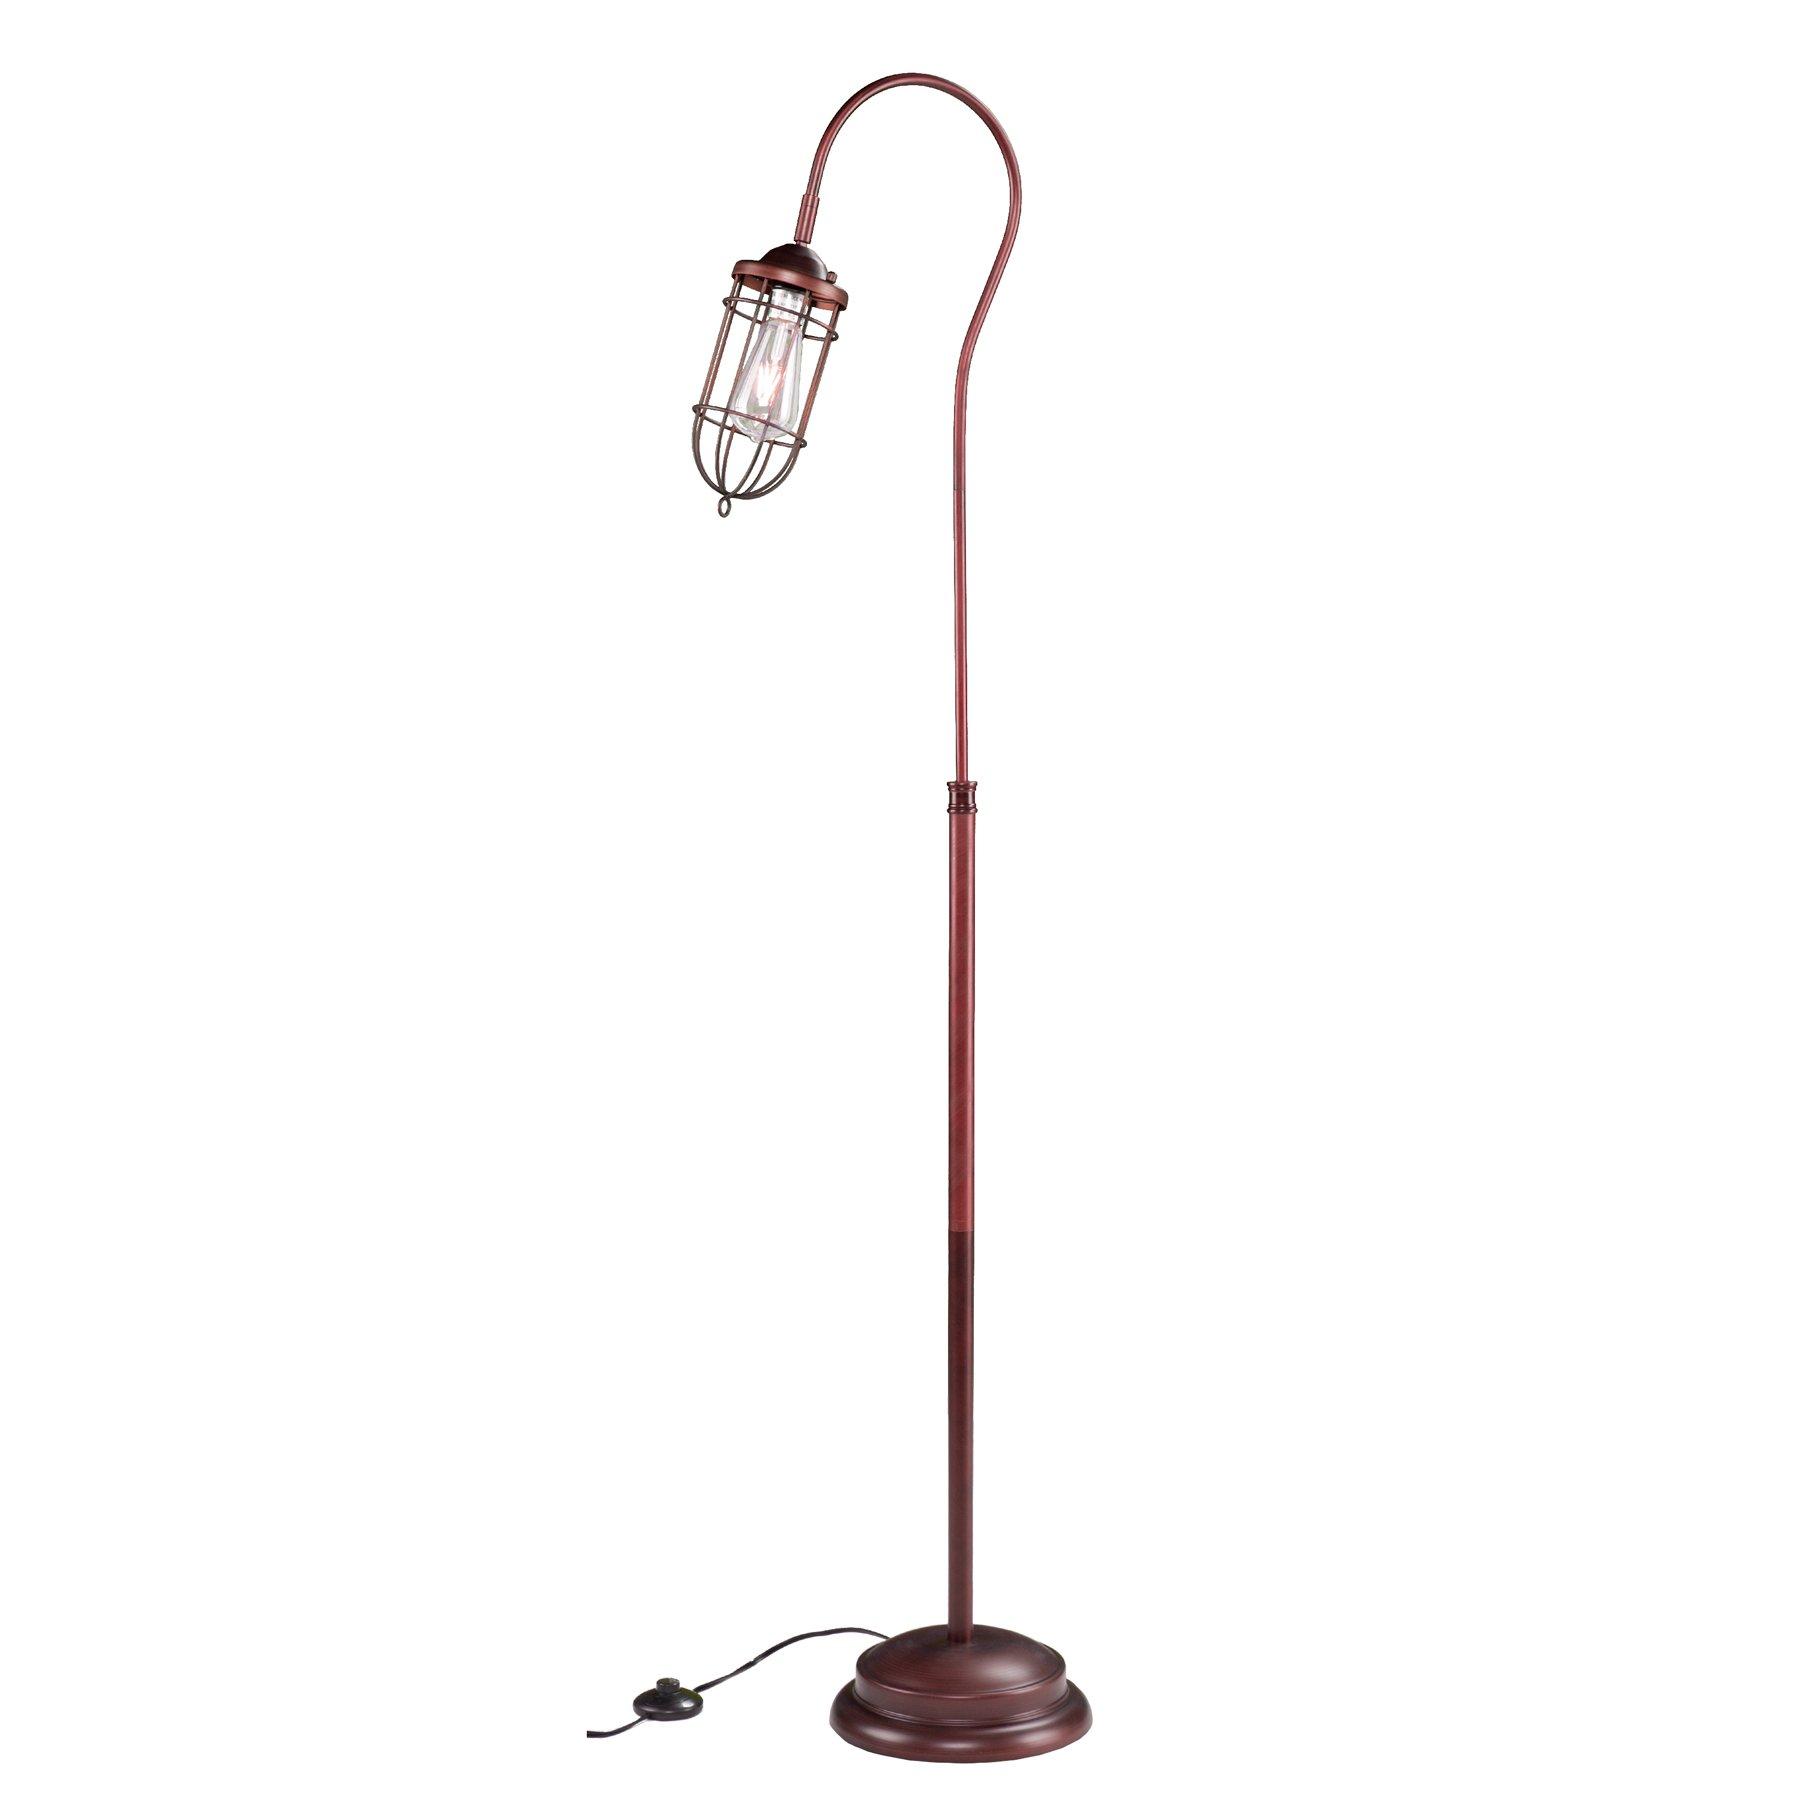 Southern Enterprises Tanner Floor lamp